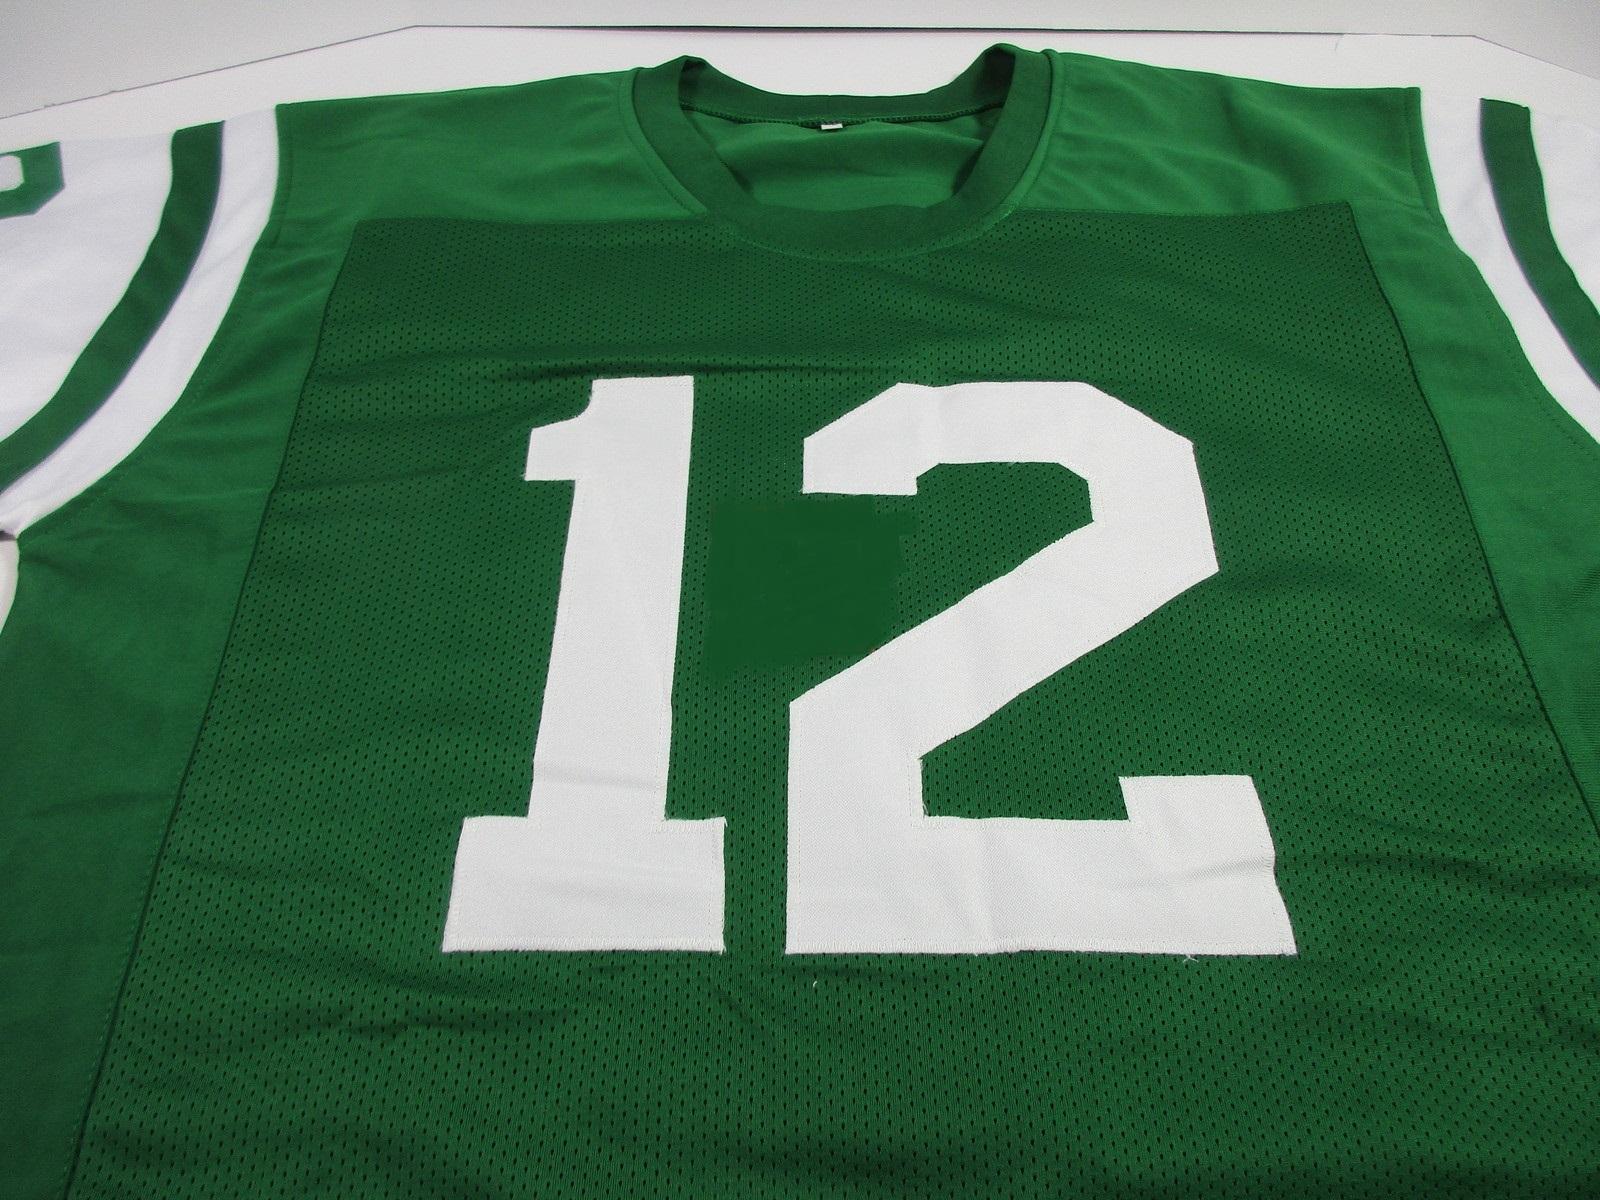 367424a6939 JOE NAMATH - NFL HALL OF FAME - HAND SIGNED NEW YORK JETS CUSTOM JERSEY -